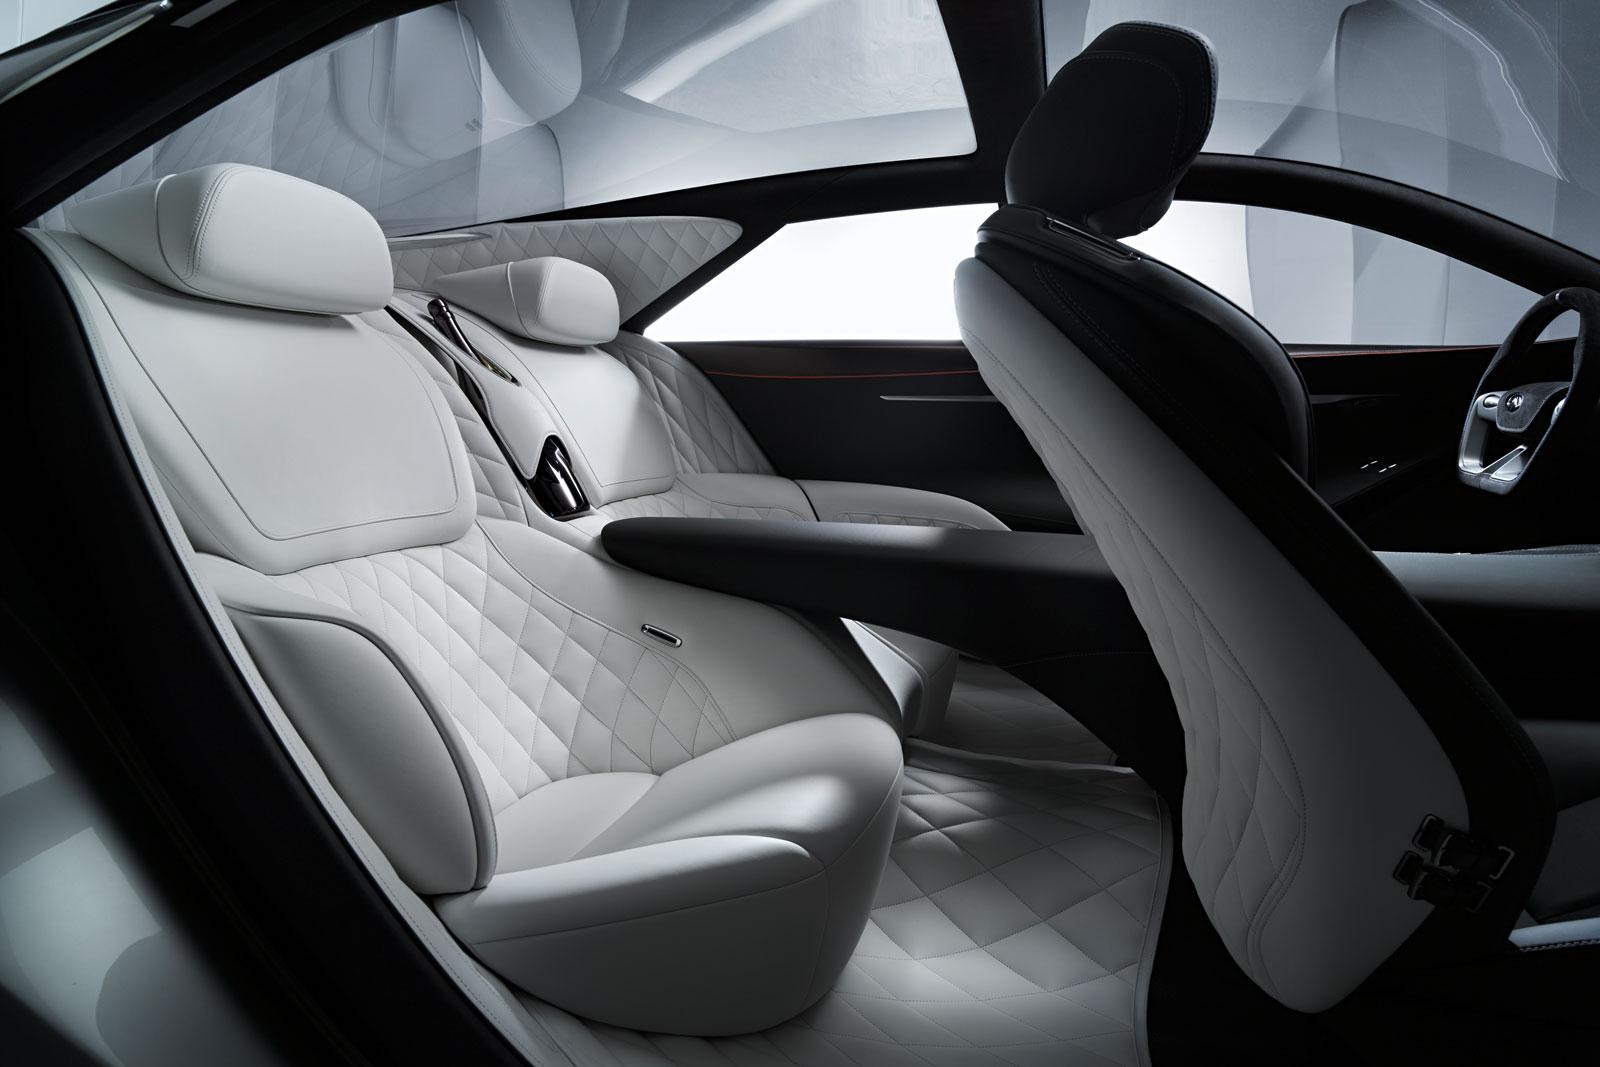 infiniti q80 inspiration concept interior car body design. Black Bedroom Furniture Sets. Home Design Ideas